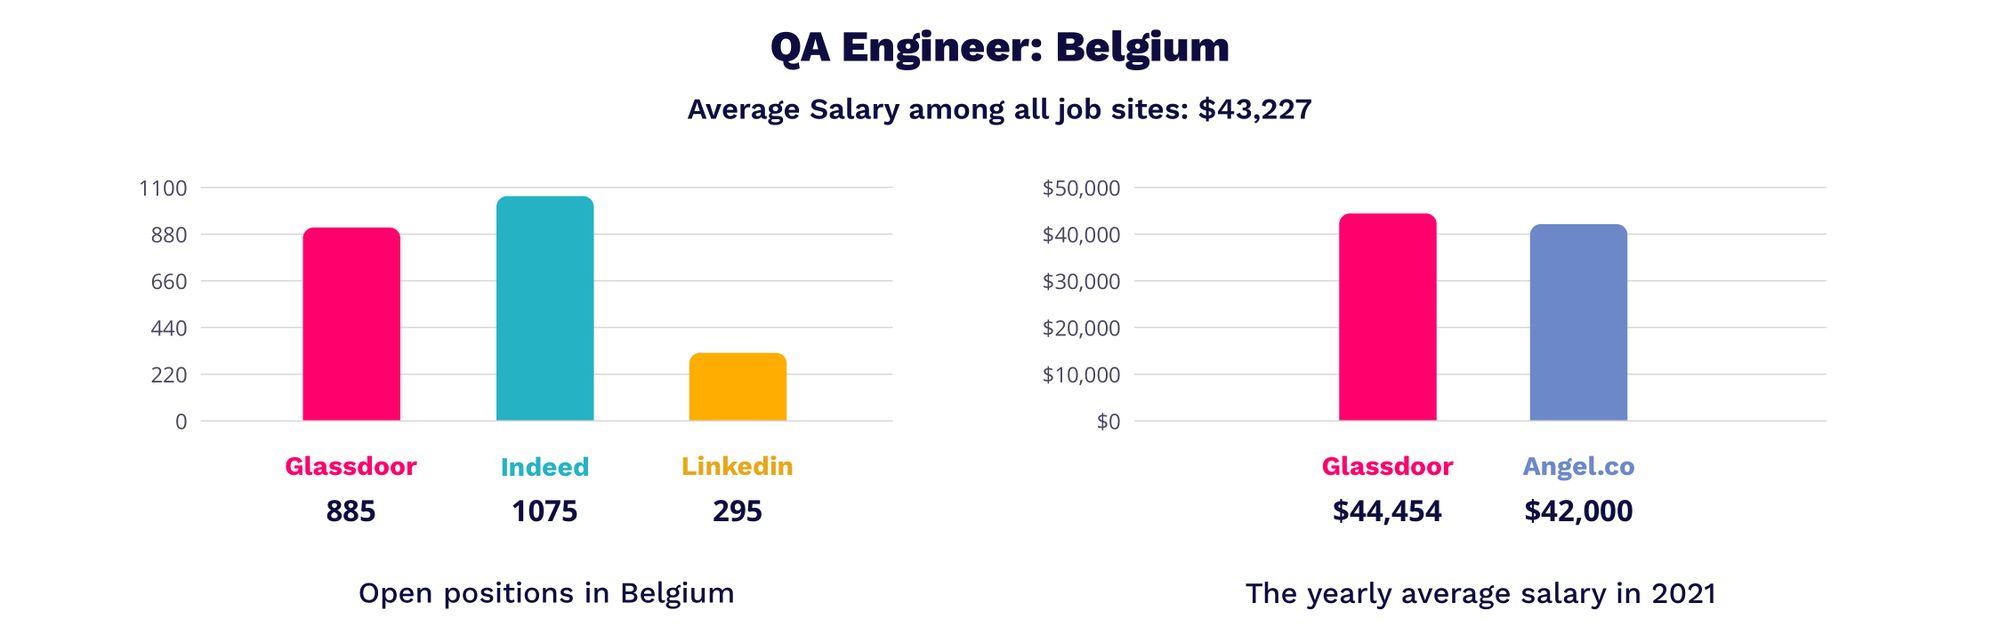 QA engineer salary in Belgium